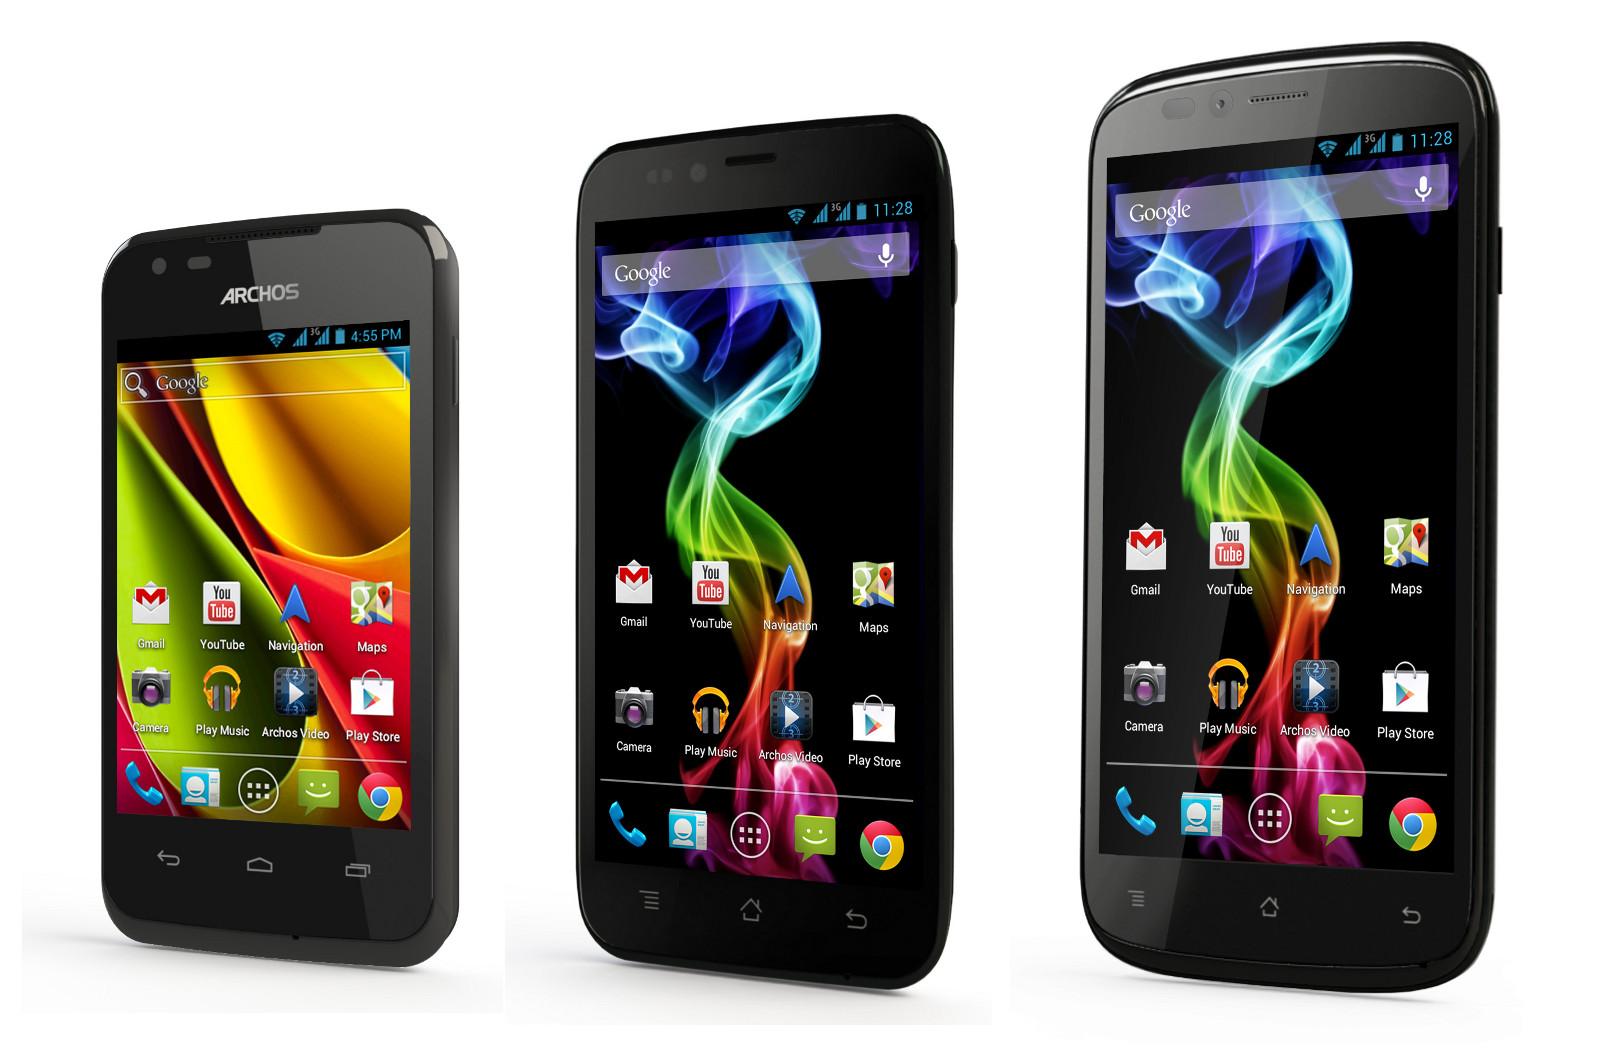 NGM Infinity, Huawei Ascend P6 e Dynamic Maxi: le offerte di Amazon (Luglio 2014)